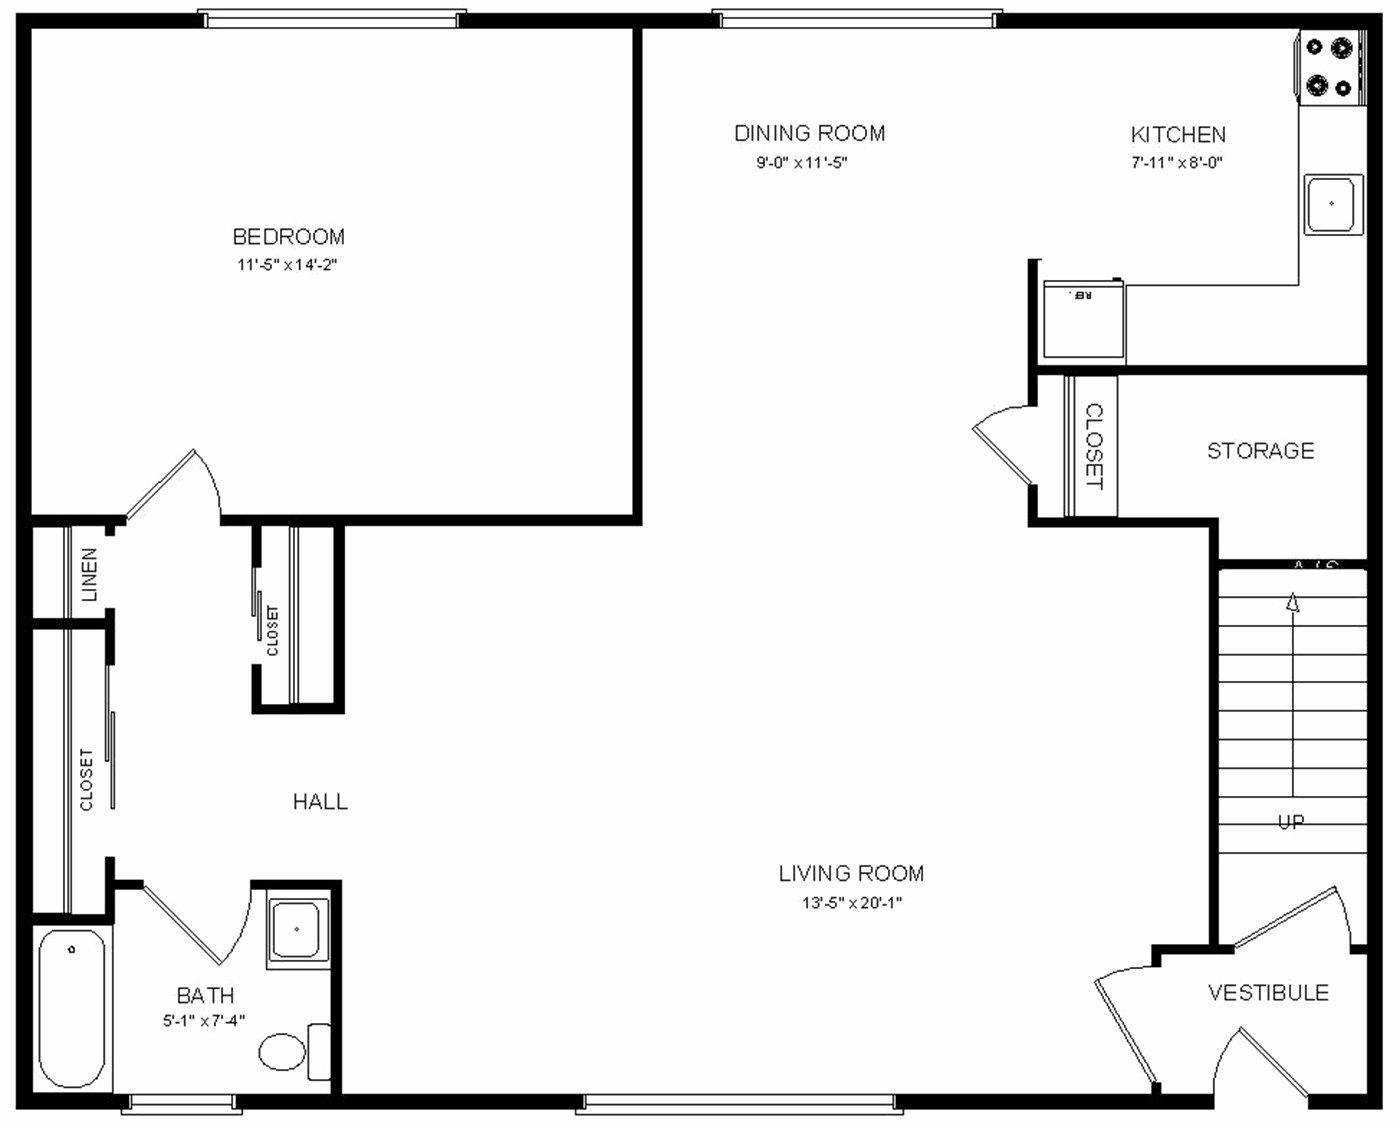 Floor Plan Templates Free Fresh Floor Plan Template